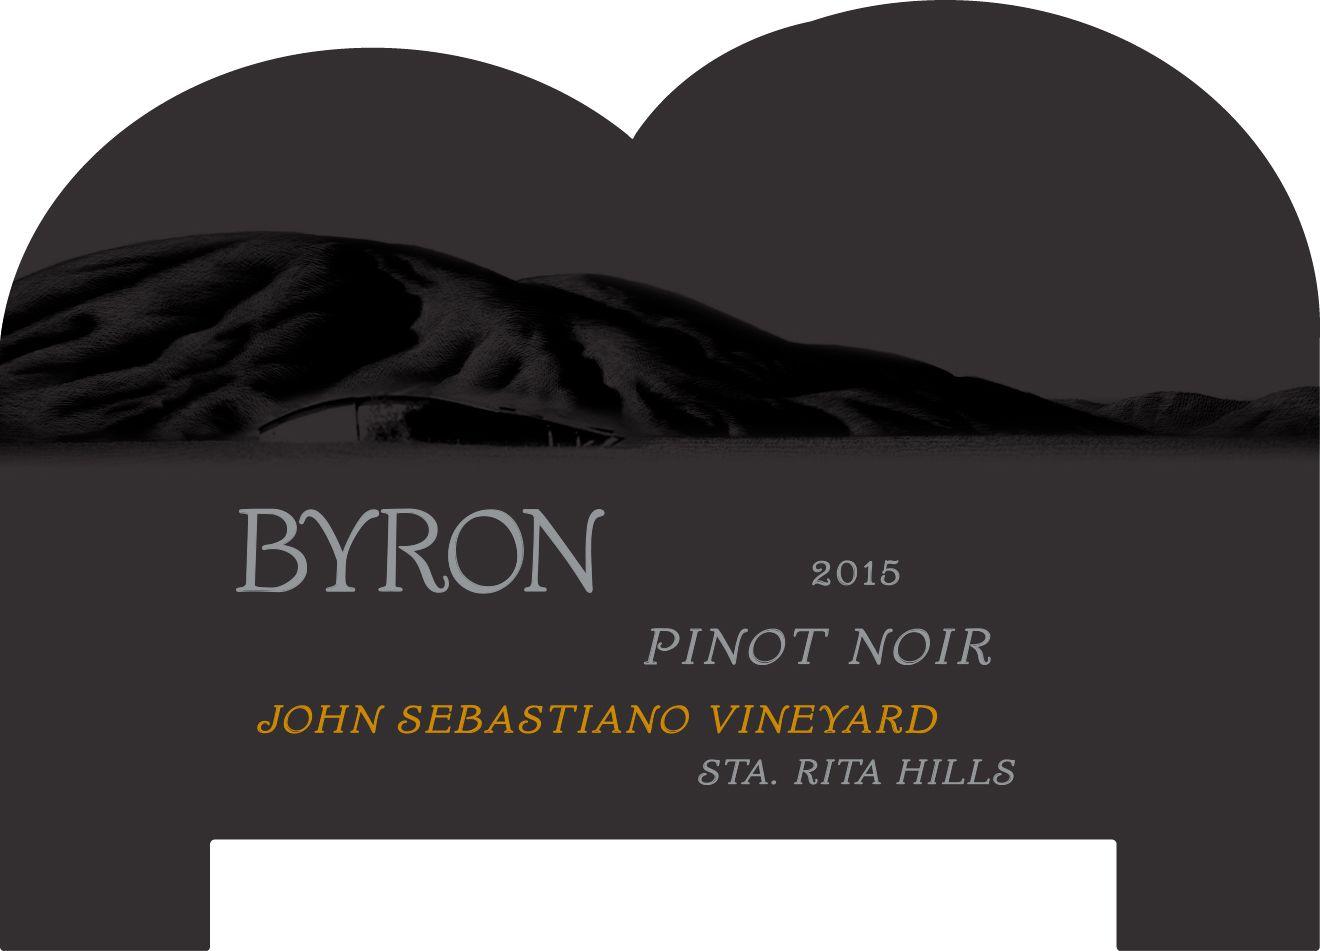 Byron John Sebastiano Vineyard Pinot Noir 2015